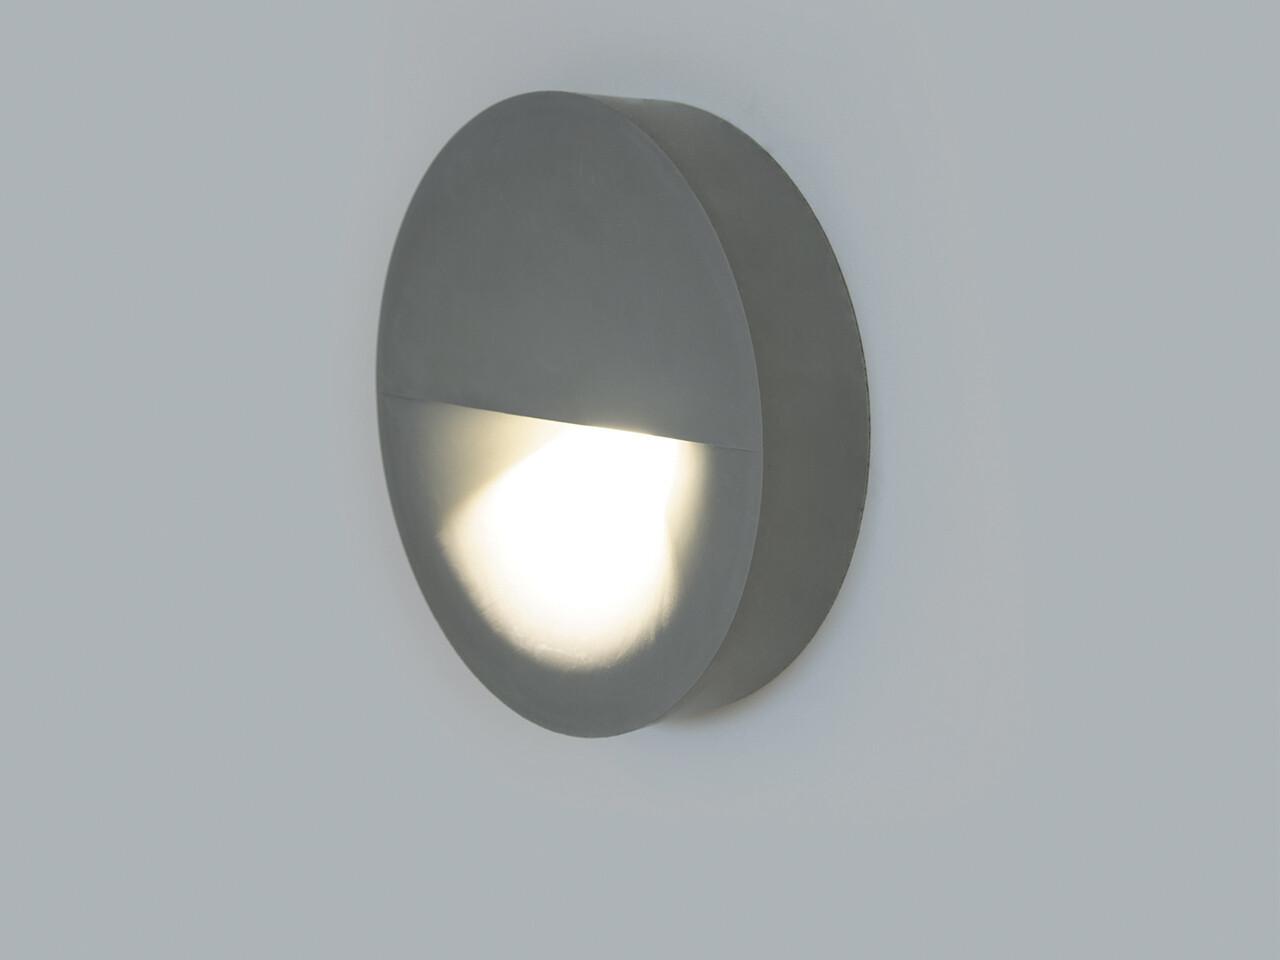 9010 Wandleuchte LEVICO LED 10W, IP65, grau